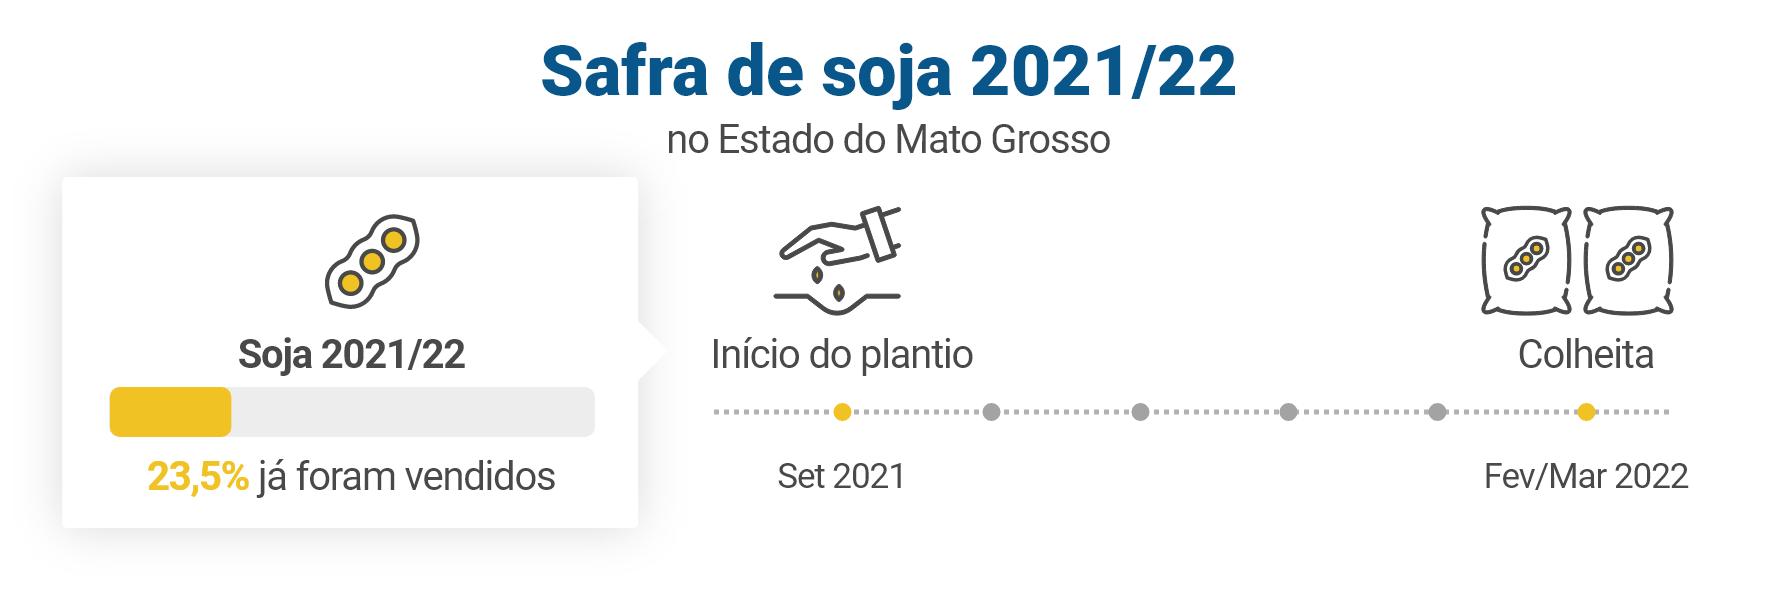 Safra de soja 2021/22